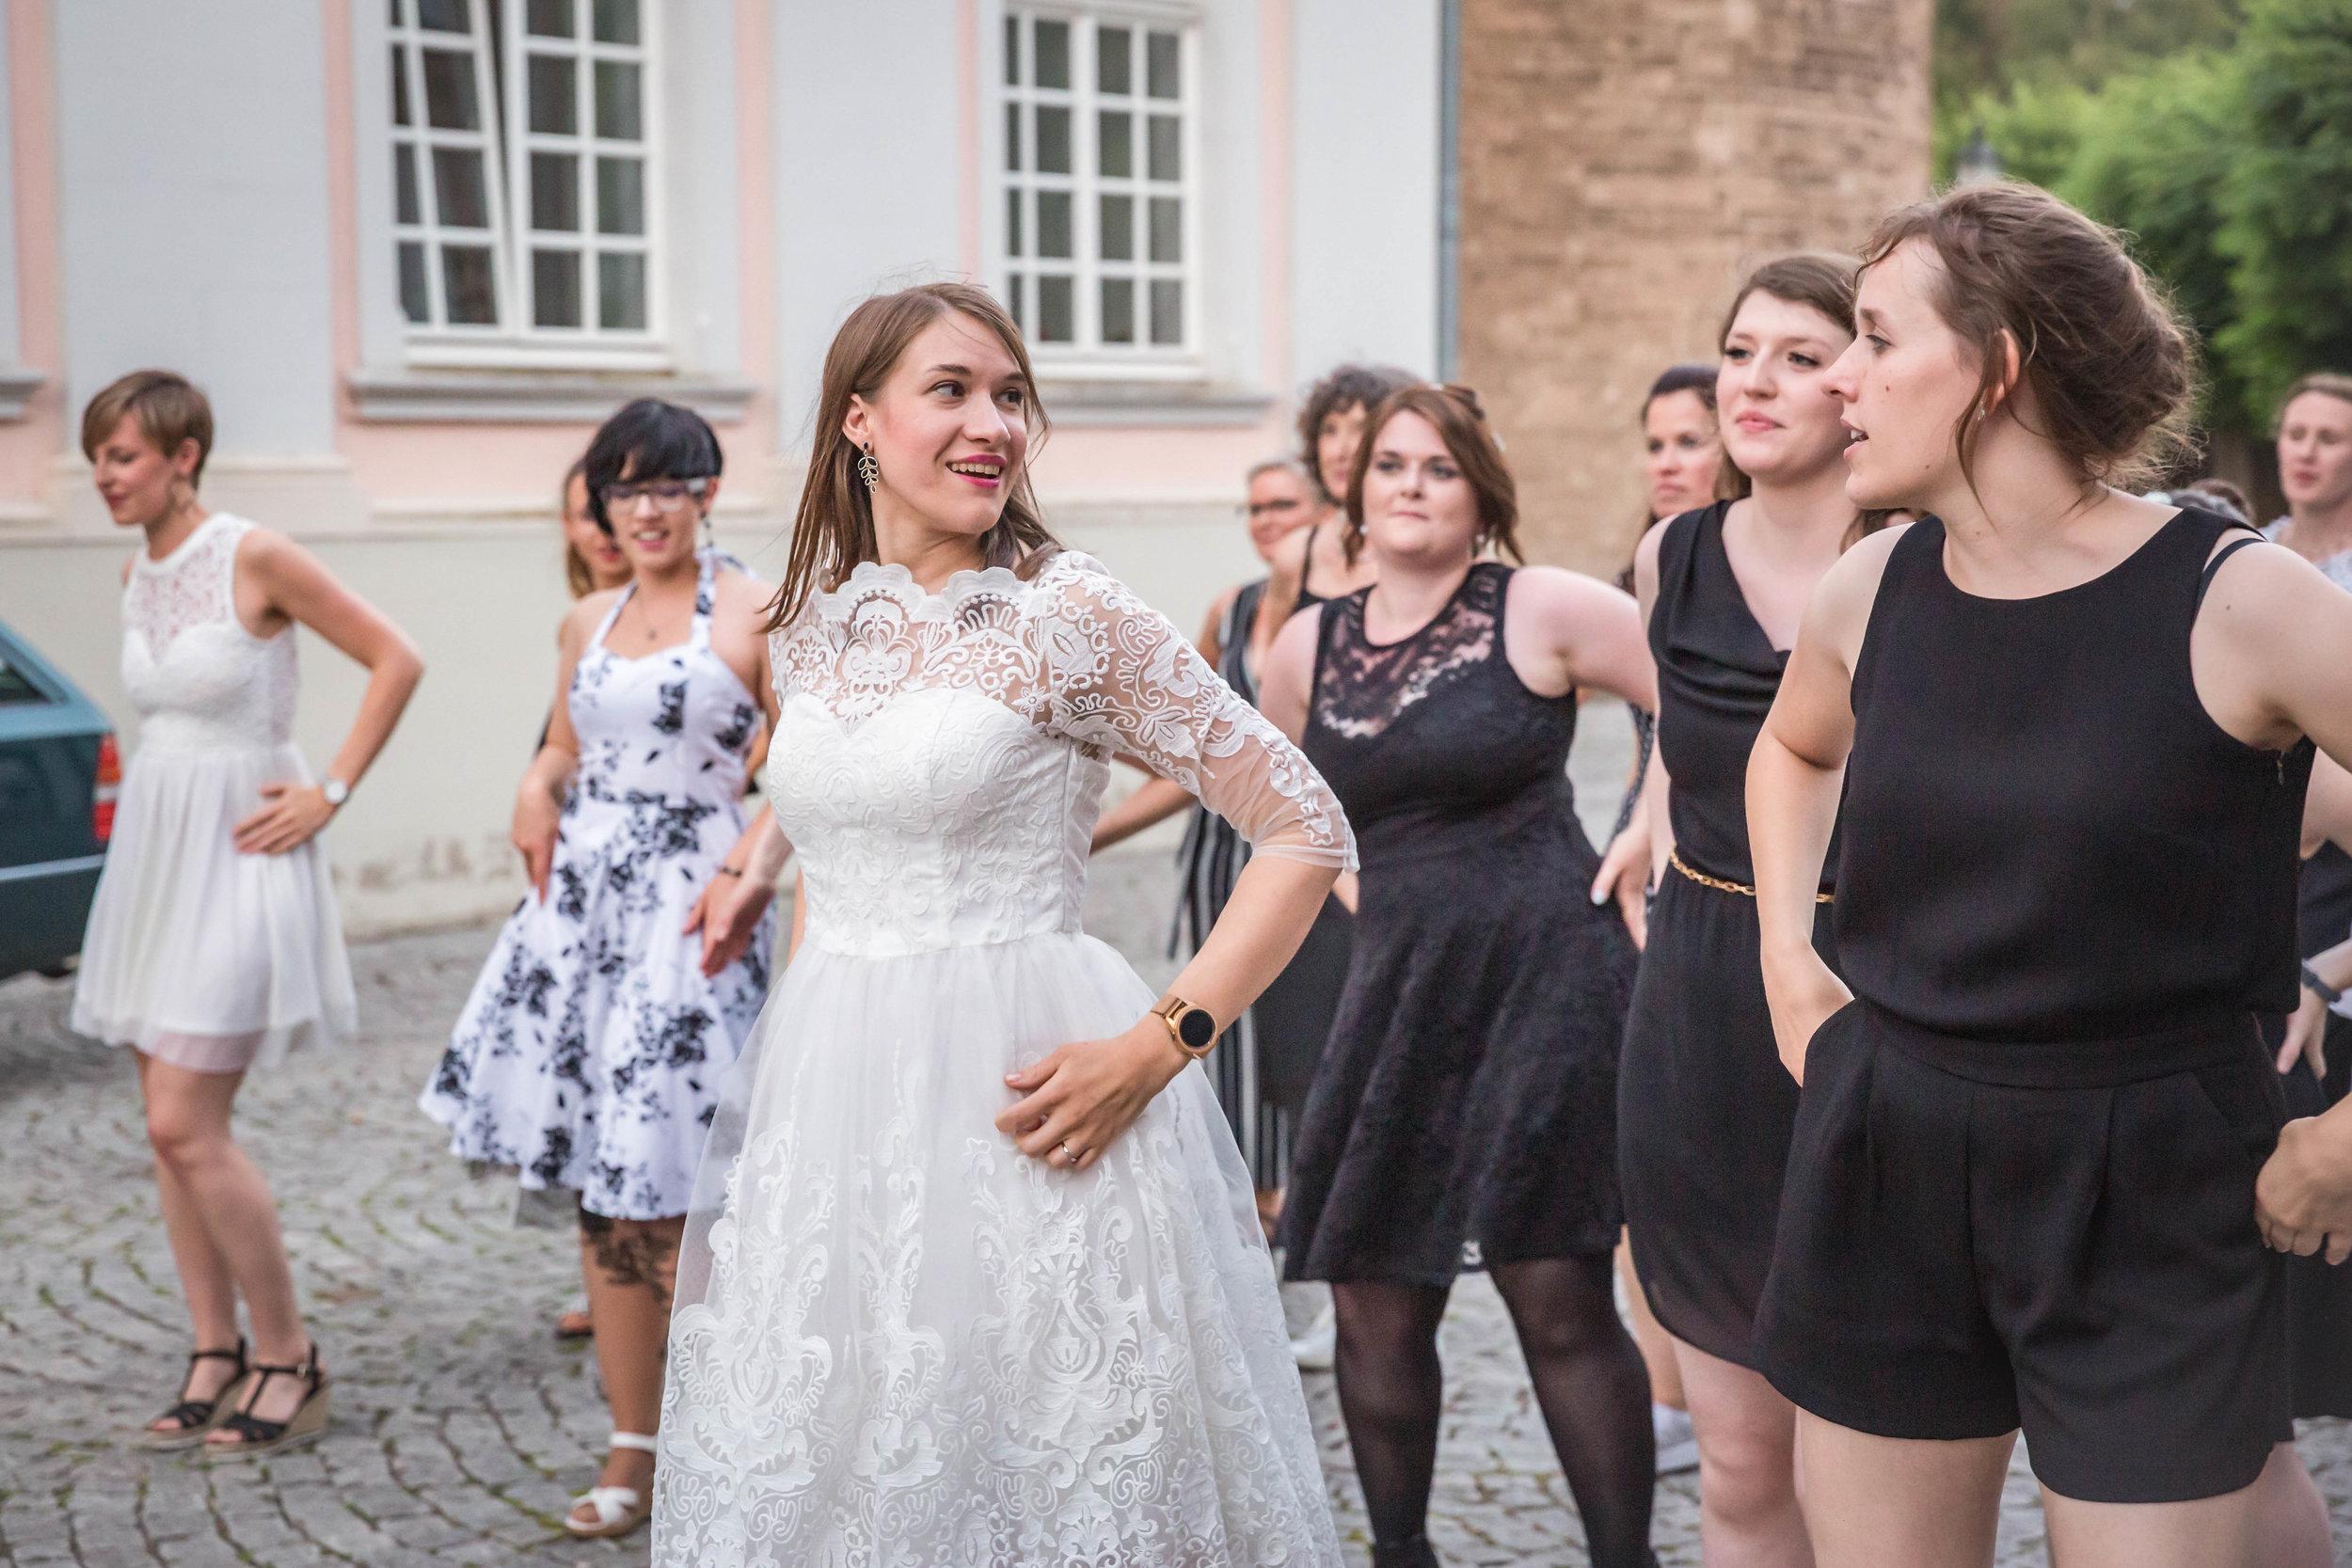 20190626_Akademie_40-jähriges_Jubiläum_FB_kl-5312077.jpg